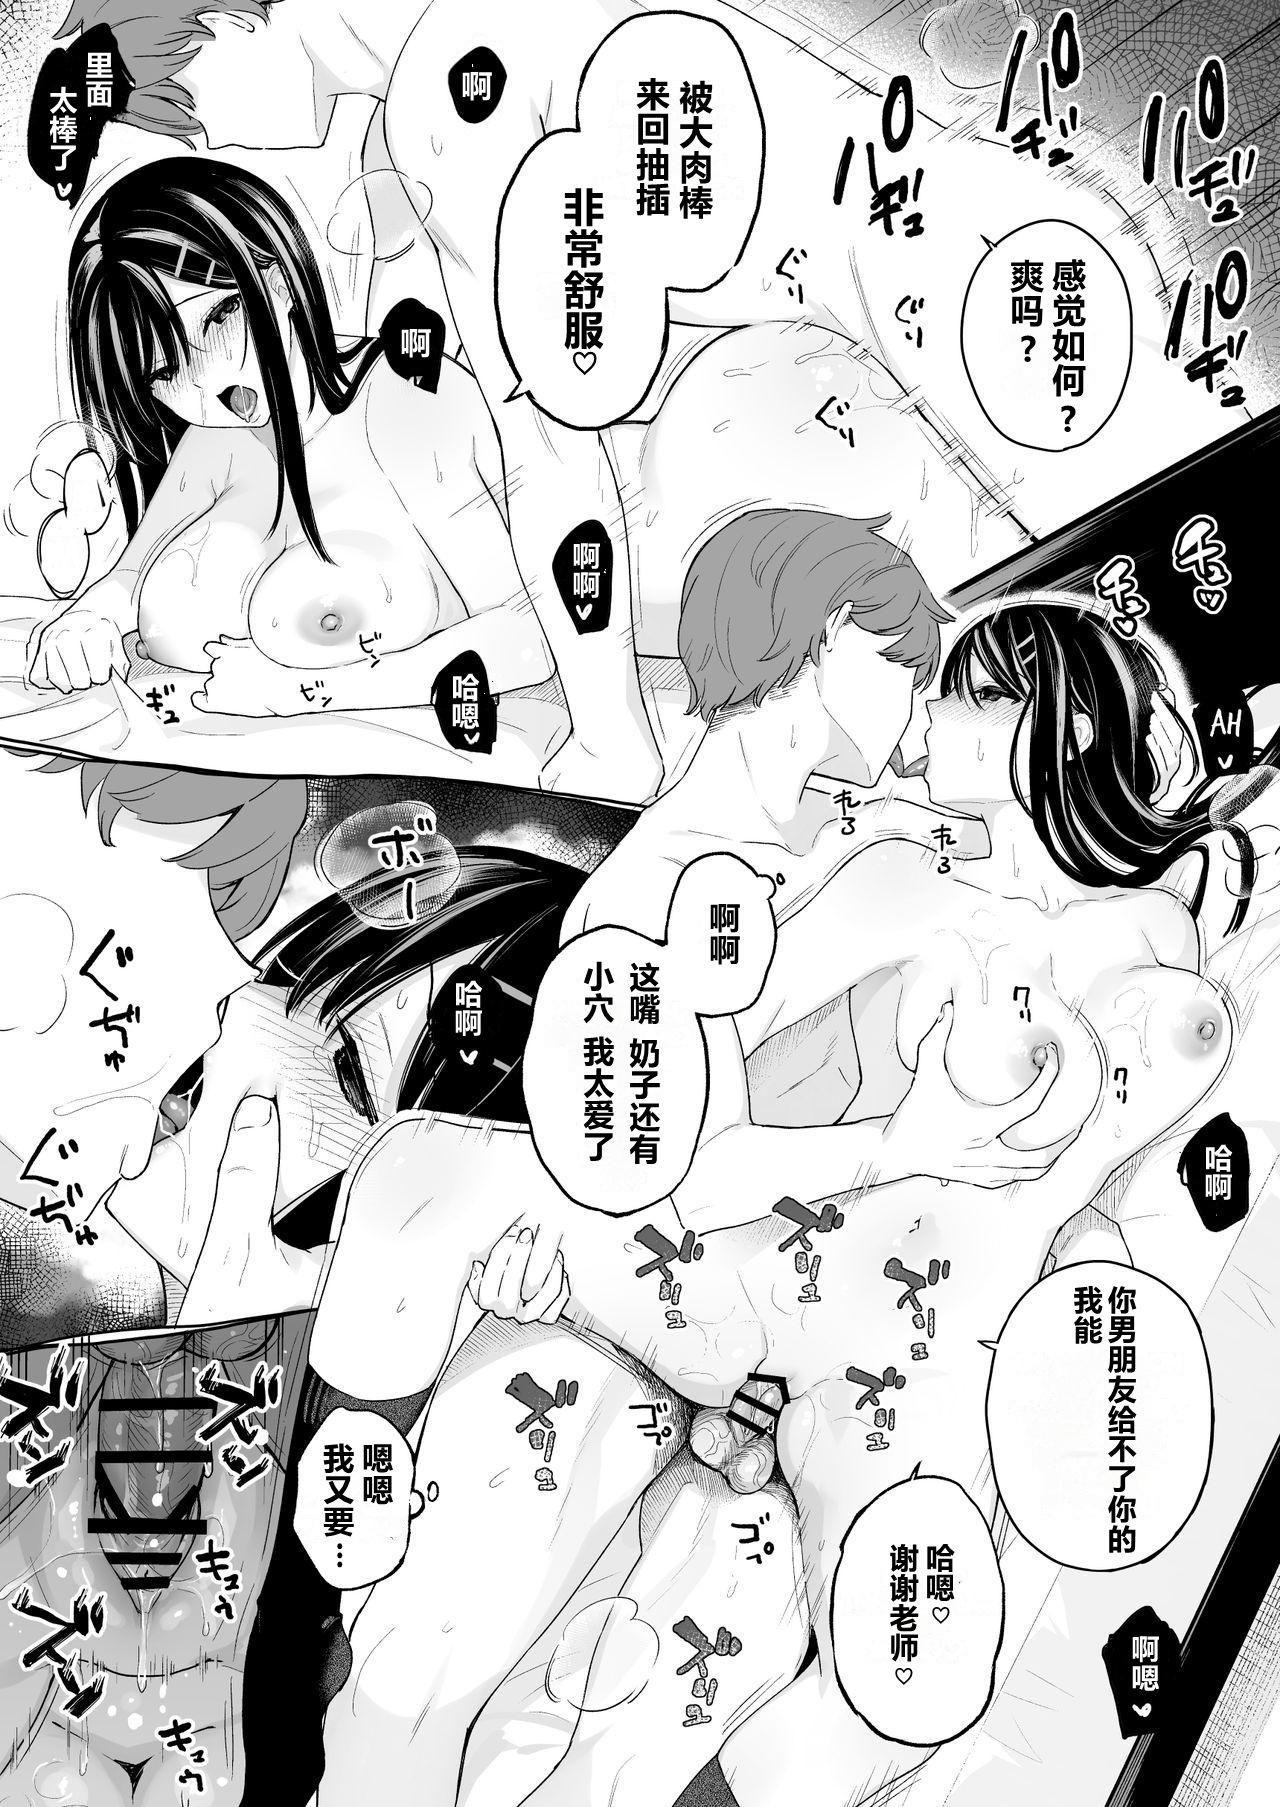 Itomusubi Vol. 4 37